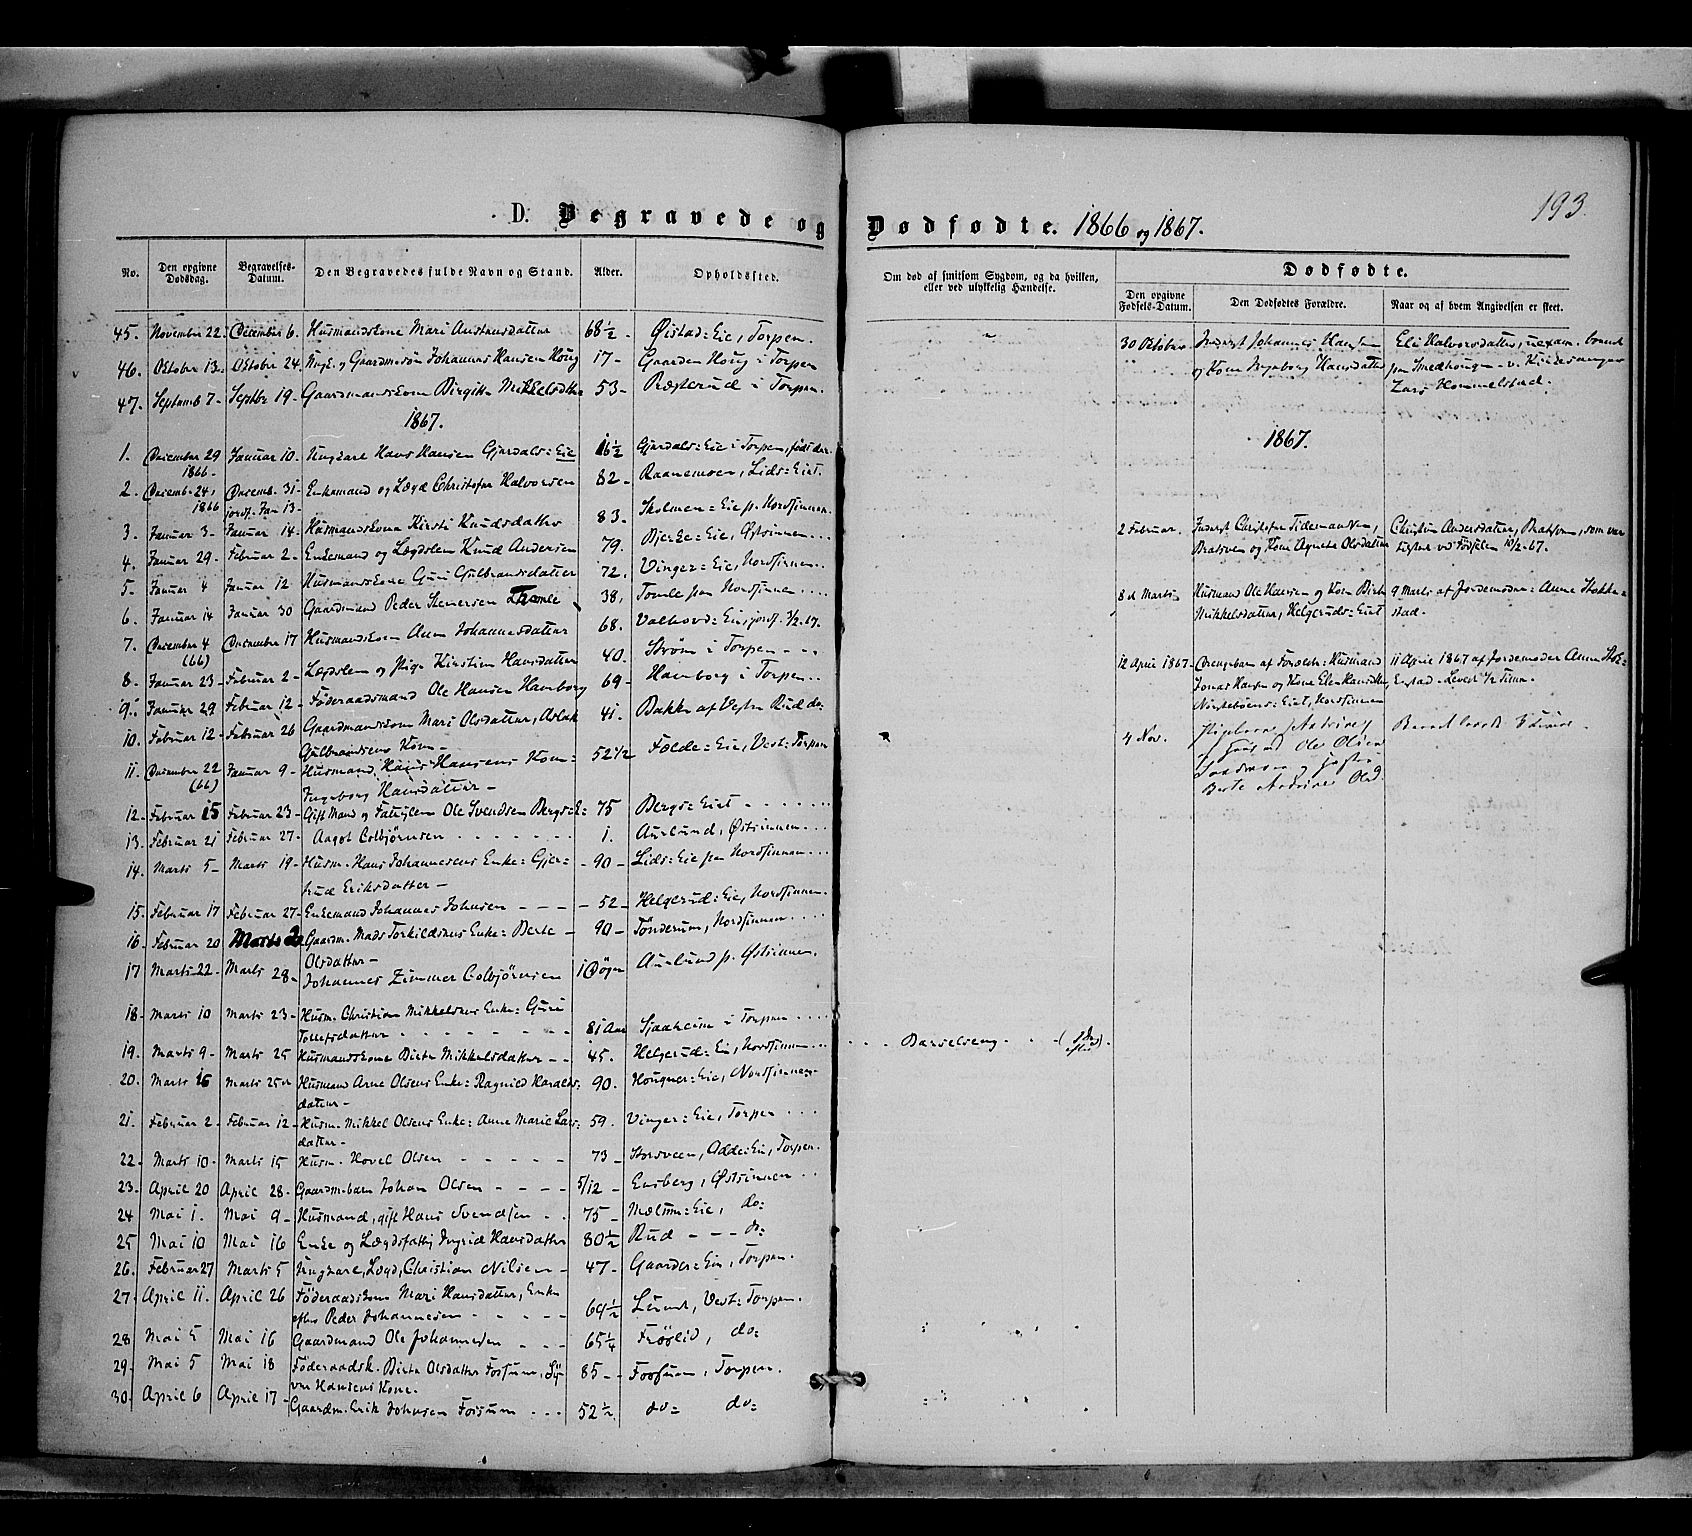 SAH, Nordre Land prestekontor, Ministerialbok nr. 1, 1860-1871, s. 193